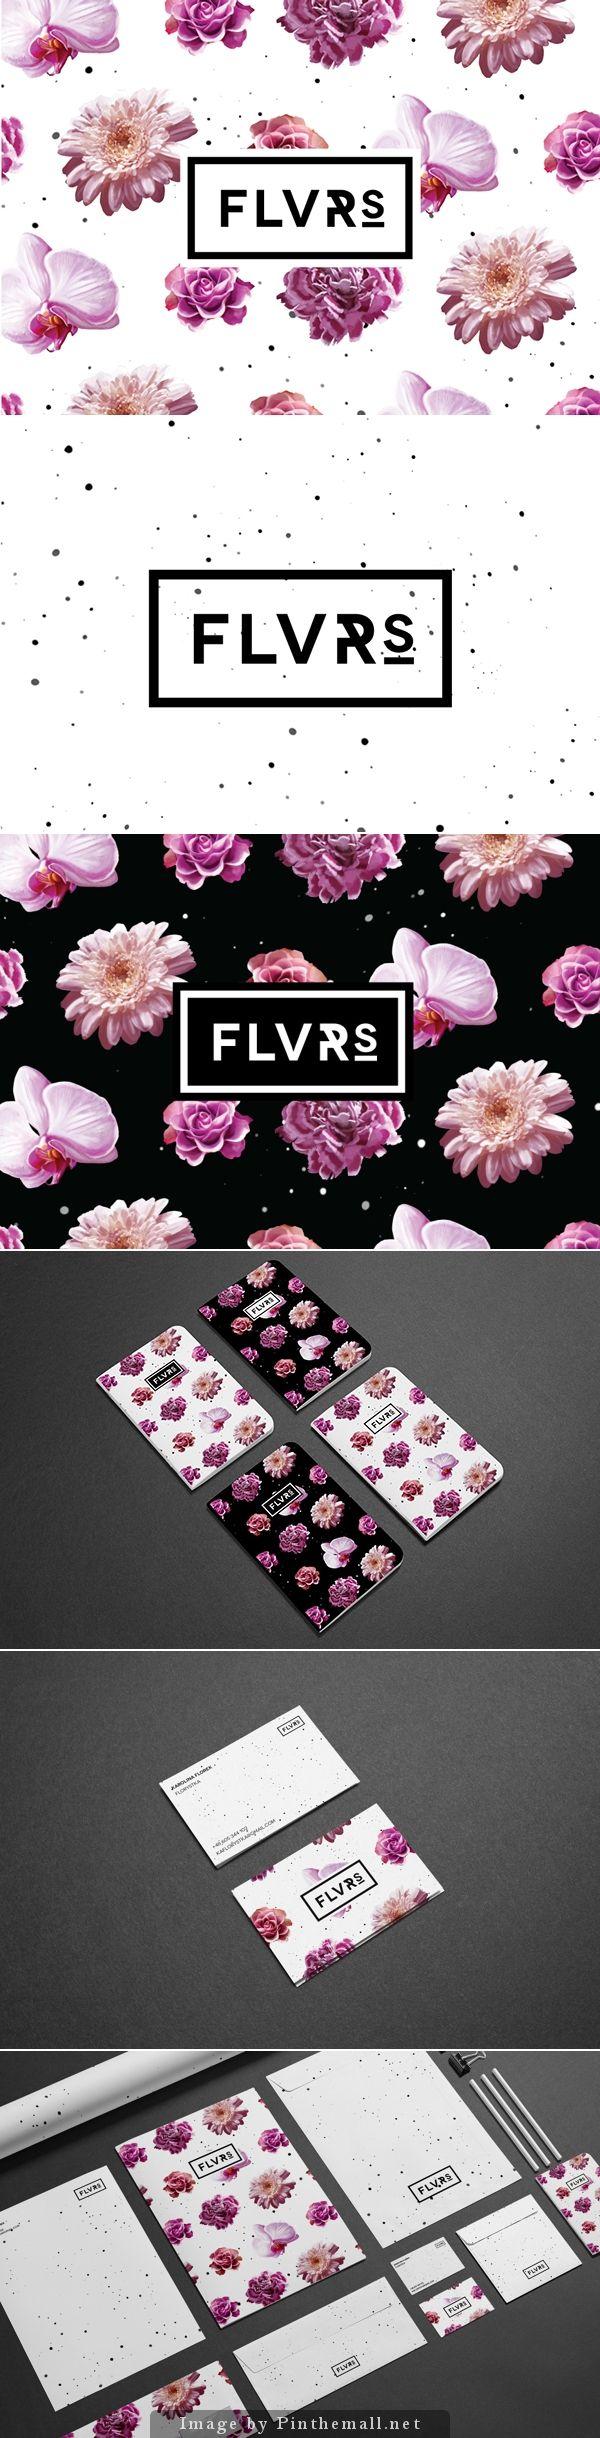 Flvrs Brand Identity